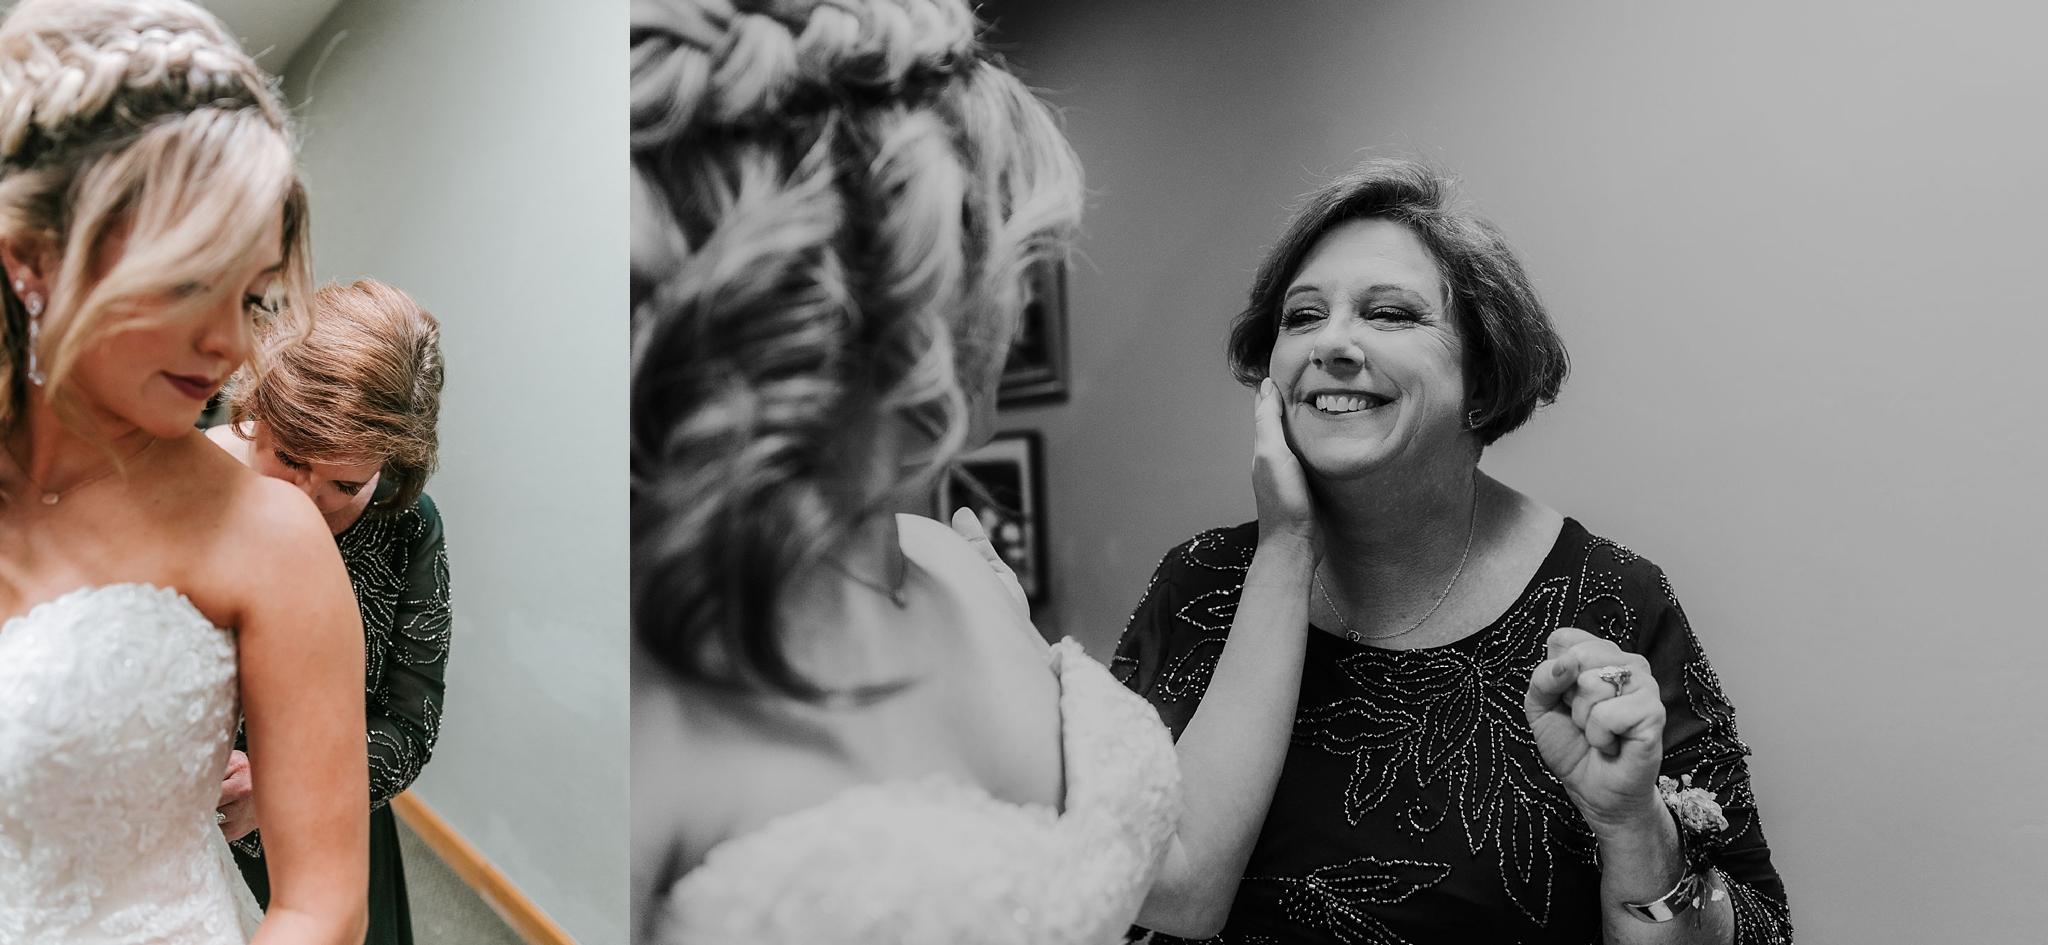 Alicia+lucia+photography+-+albuquerque+wedding+photographer+-+santa+fe+wedding+photography+-+new+mexico+wedding+photographer+-+new+mexico+wedding+-+family+photographer+-+mothers+day+-+mother+of+the+bride_0018.jpg